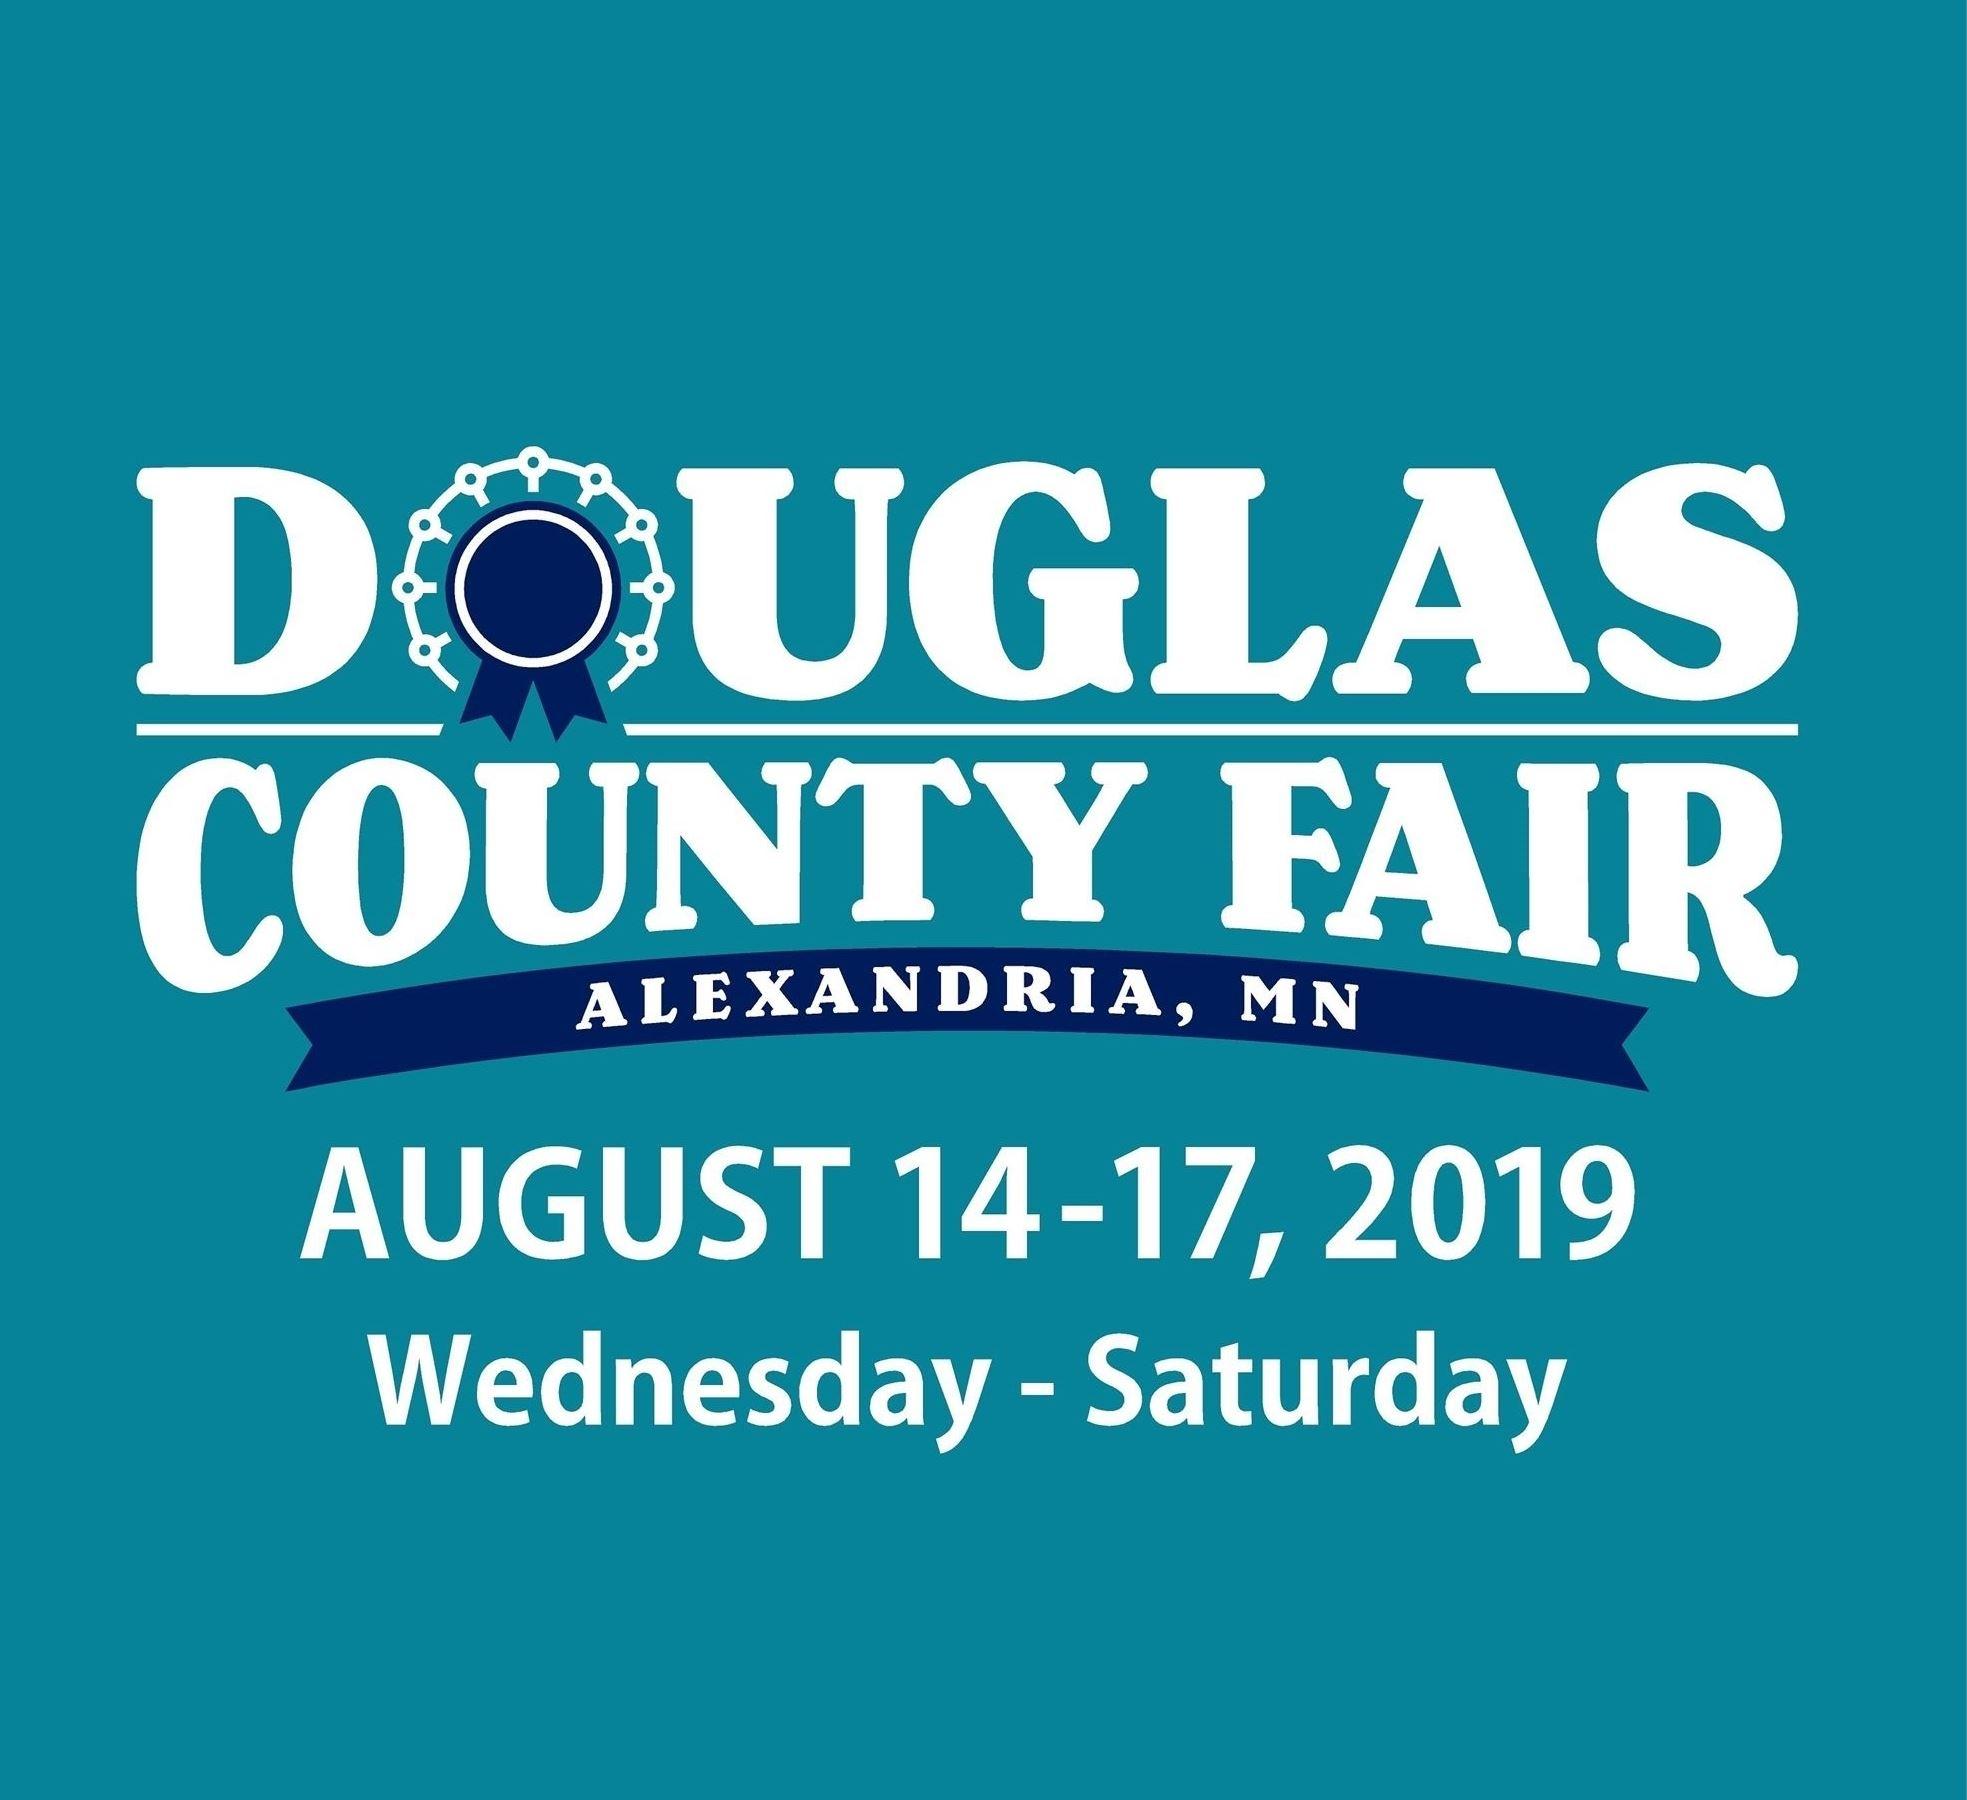 Douglas County Fair - $250/Daily Progressive Cash Giveaway